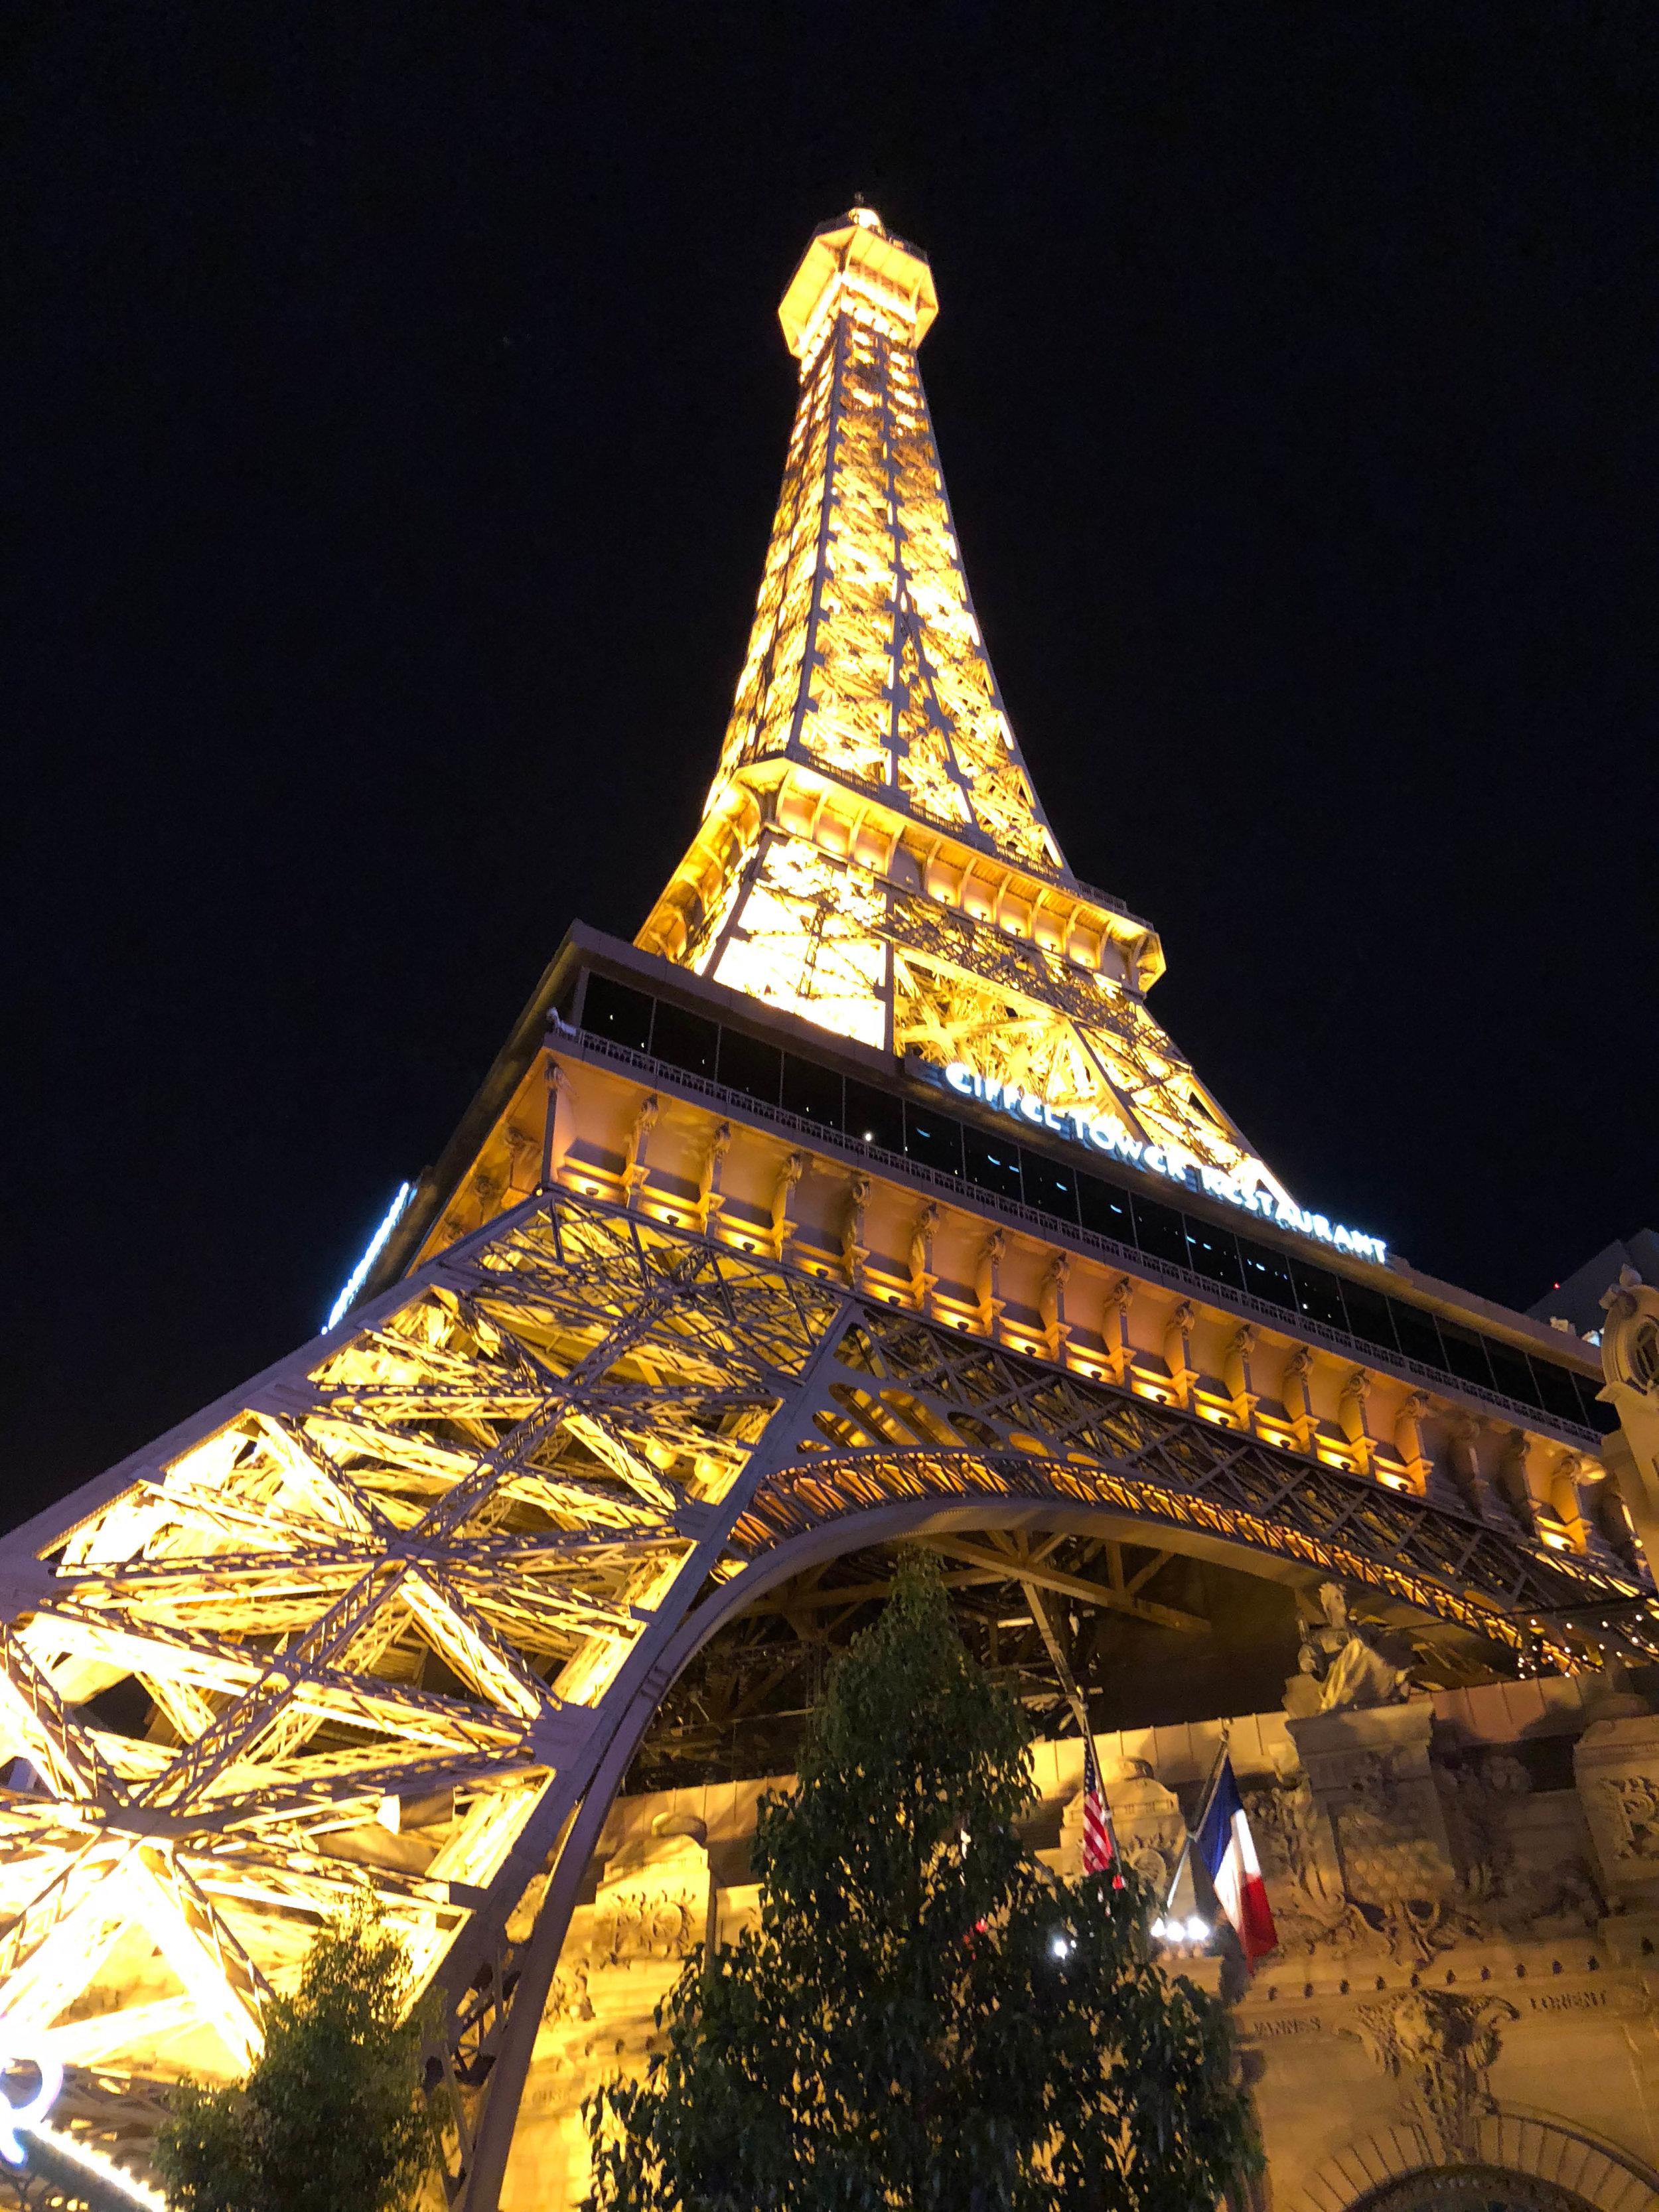 Las Vegas_Vertical Photos_the strip2.jpg